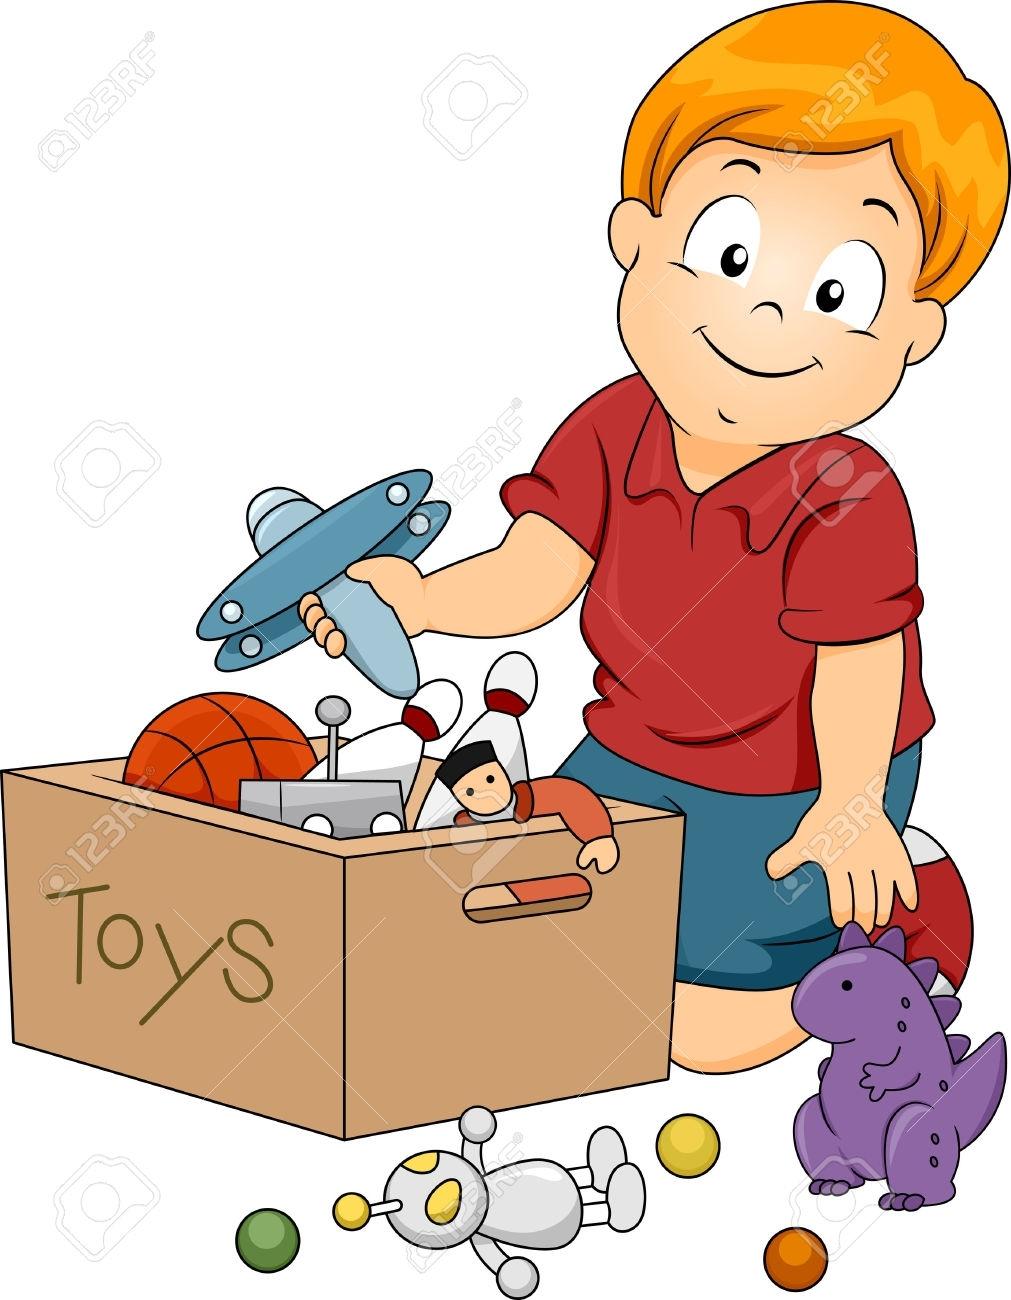 1011x1300 Fresh Clean Up Toys Clipart Design